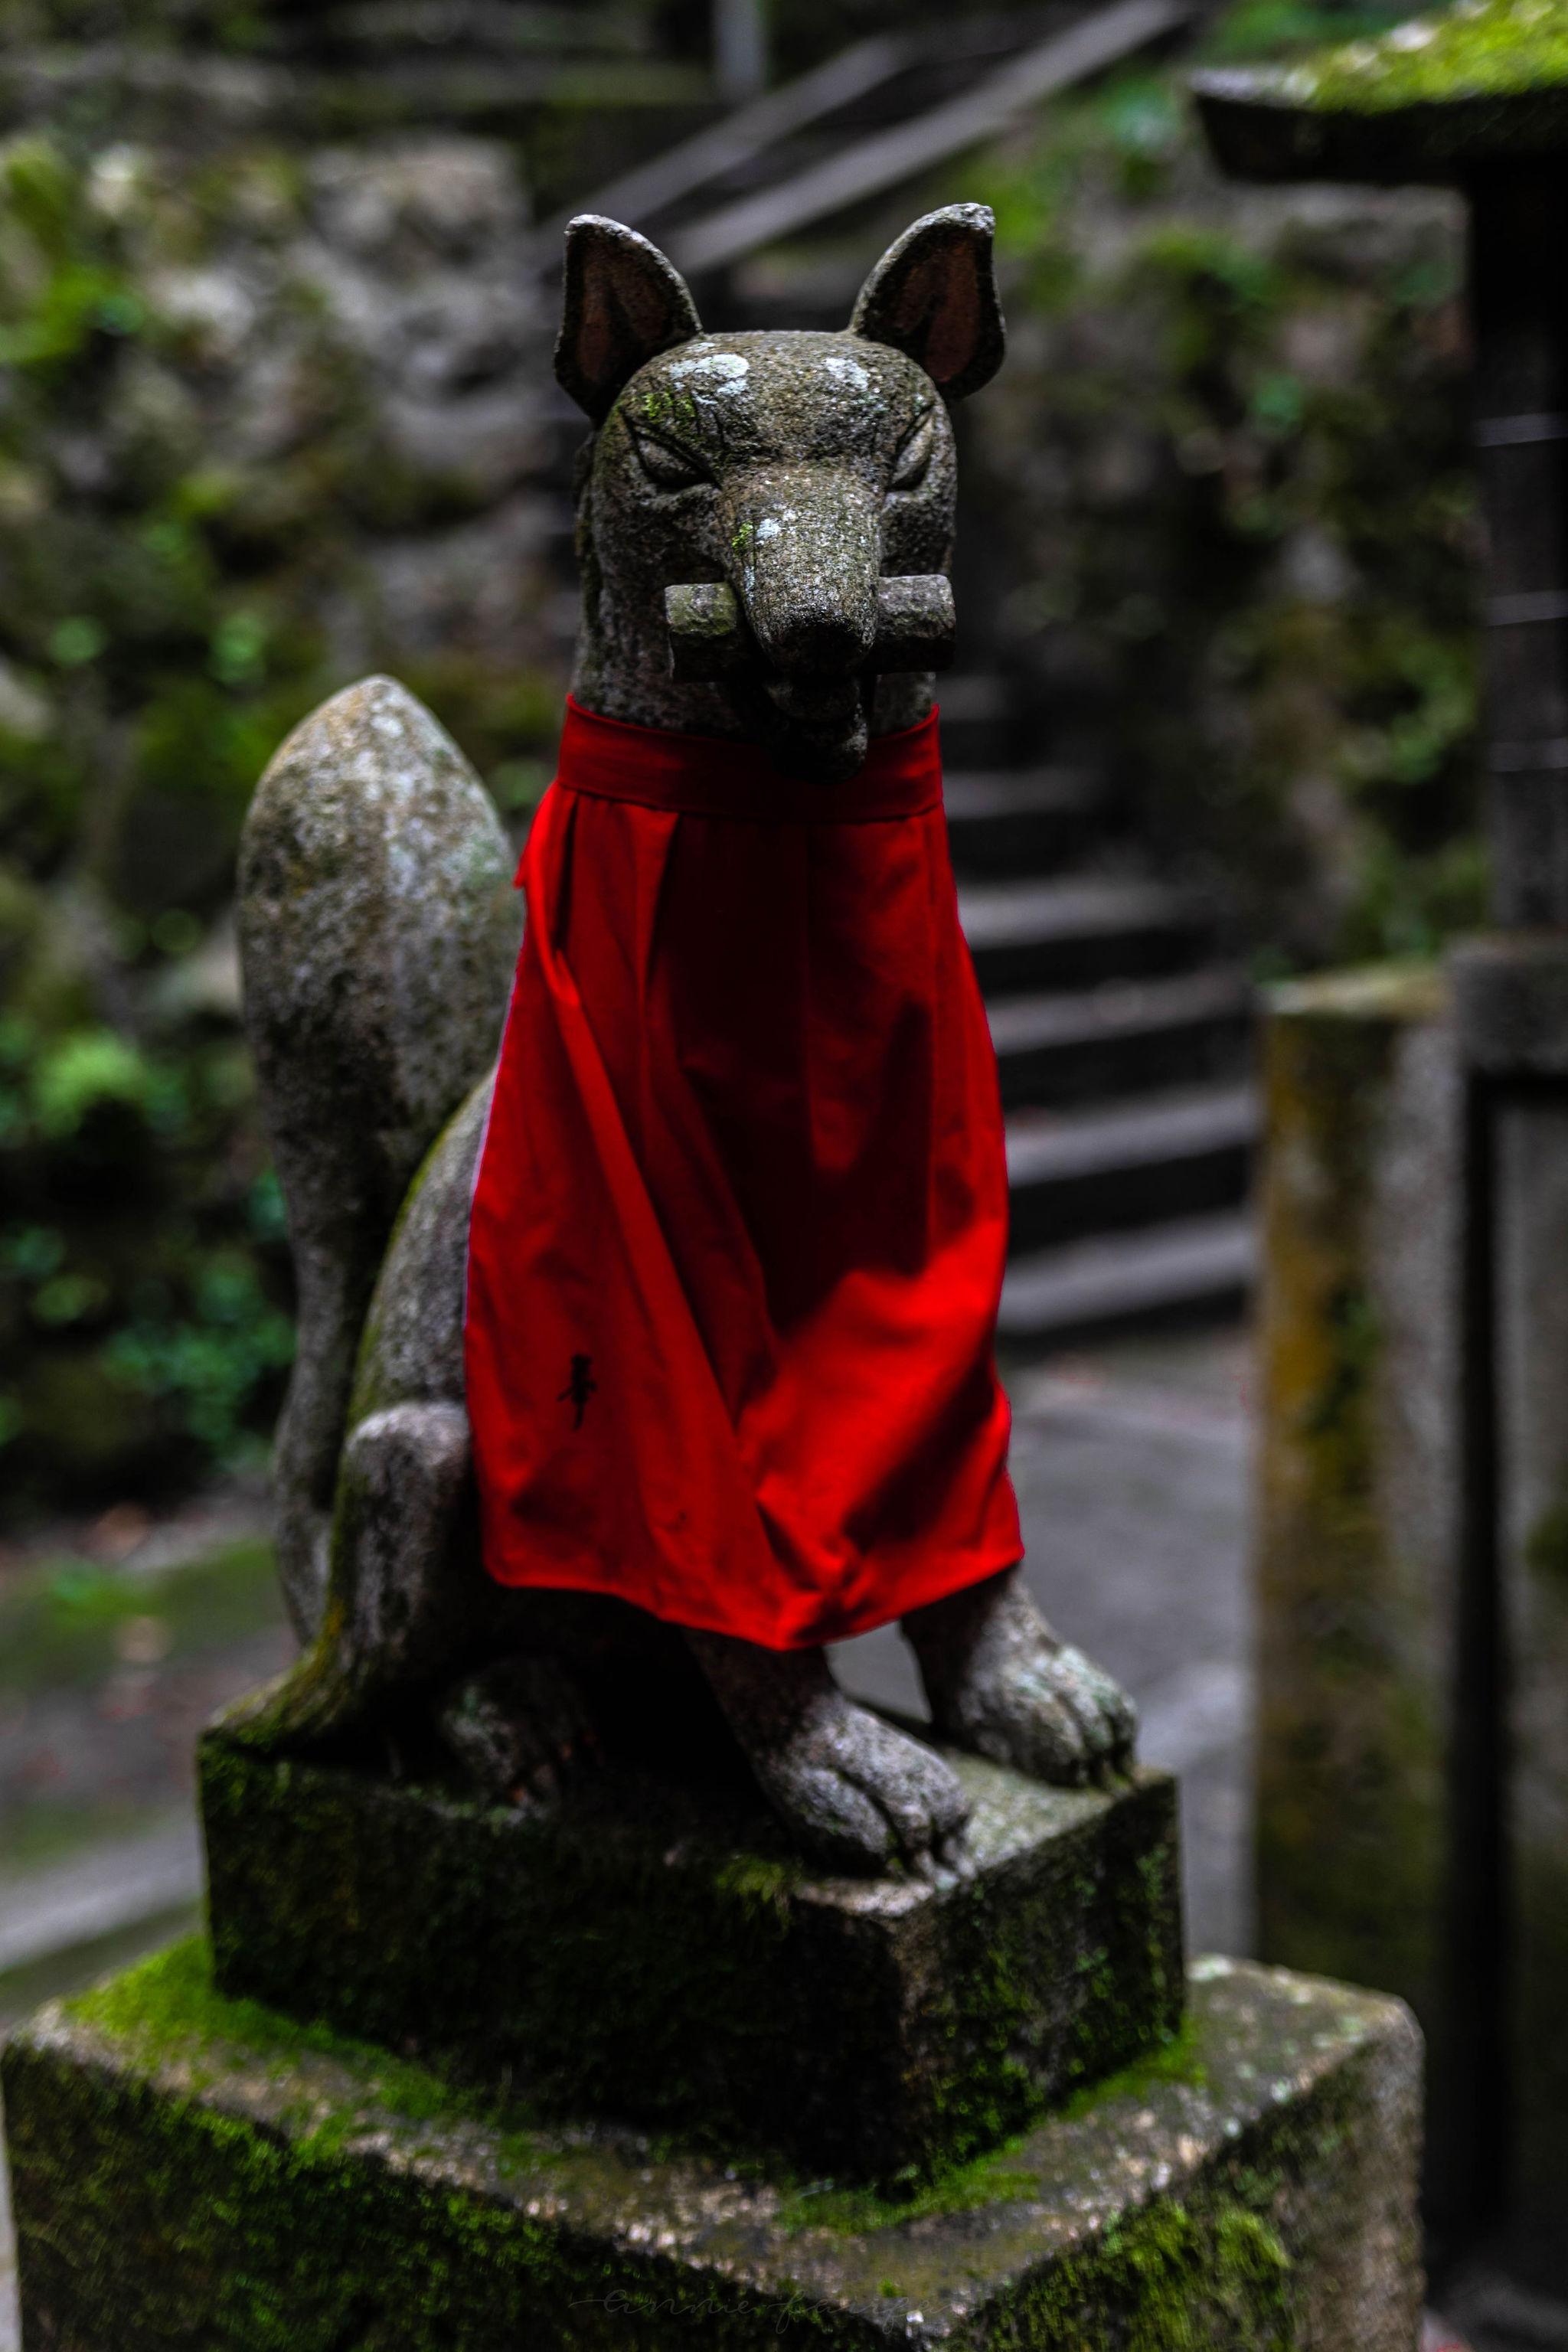 Fox Spirit Statue Kitsune at Fushimi Inari Taisha Shrine in Kyoto Japan